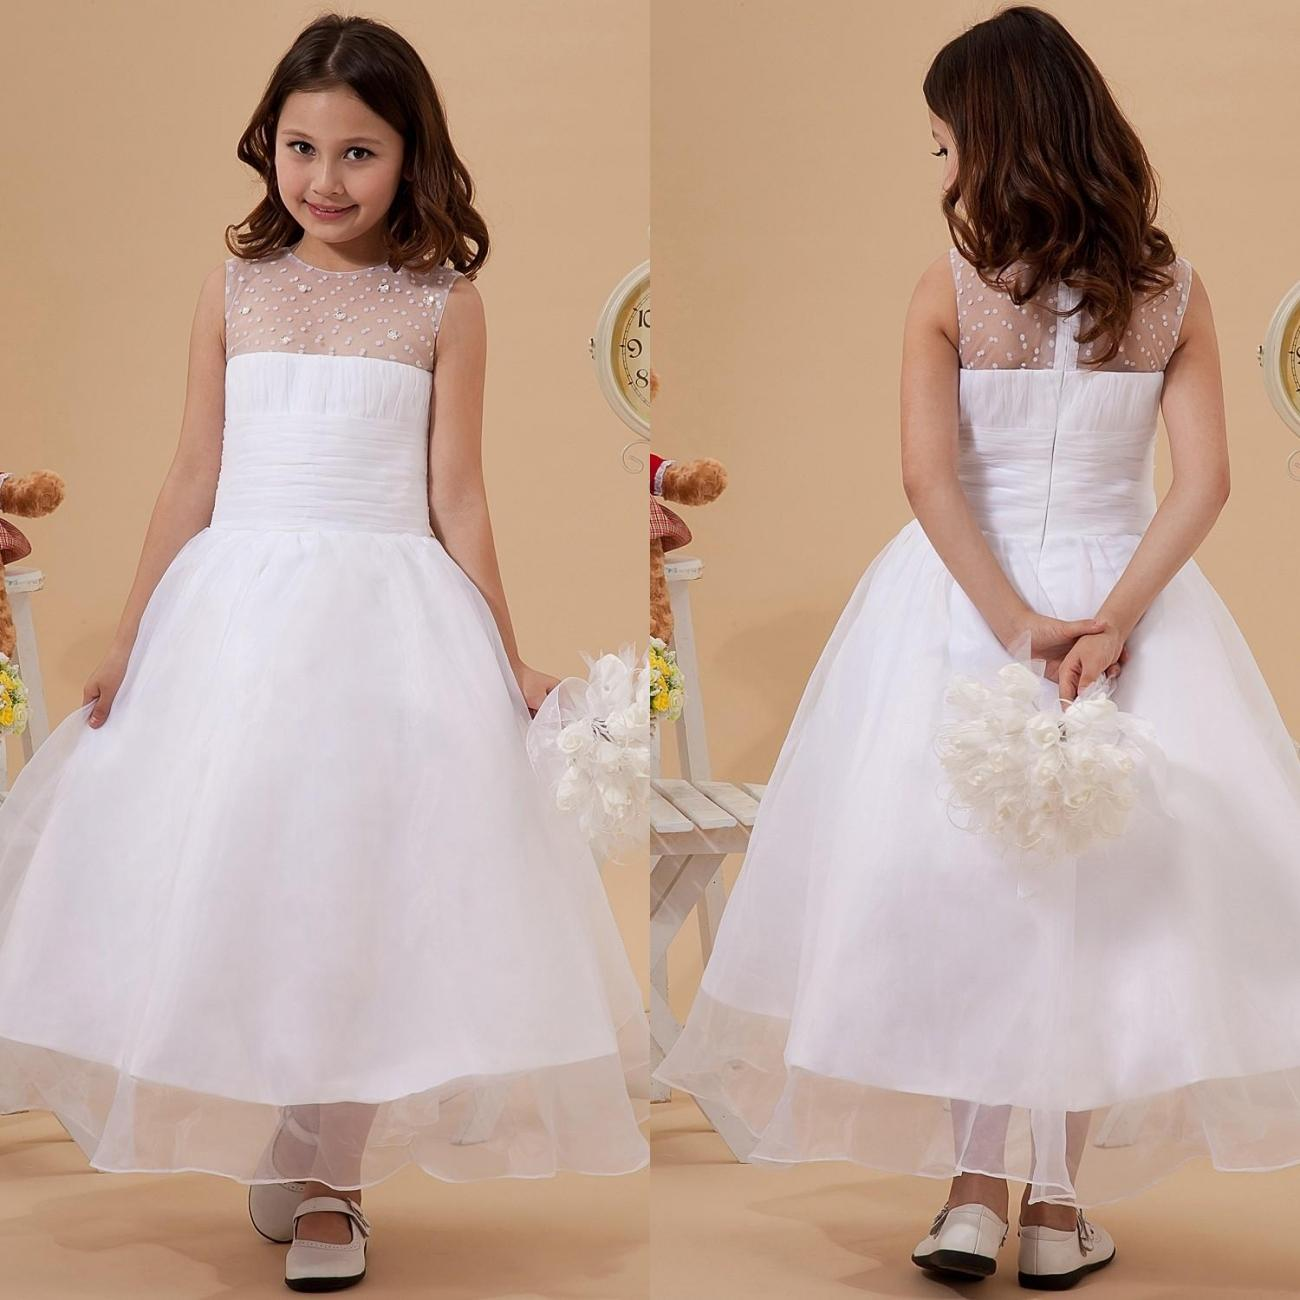 Vintage White Flower Girl Dresses 2015 With Beading Sheer Jewel ...